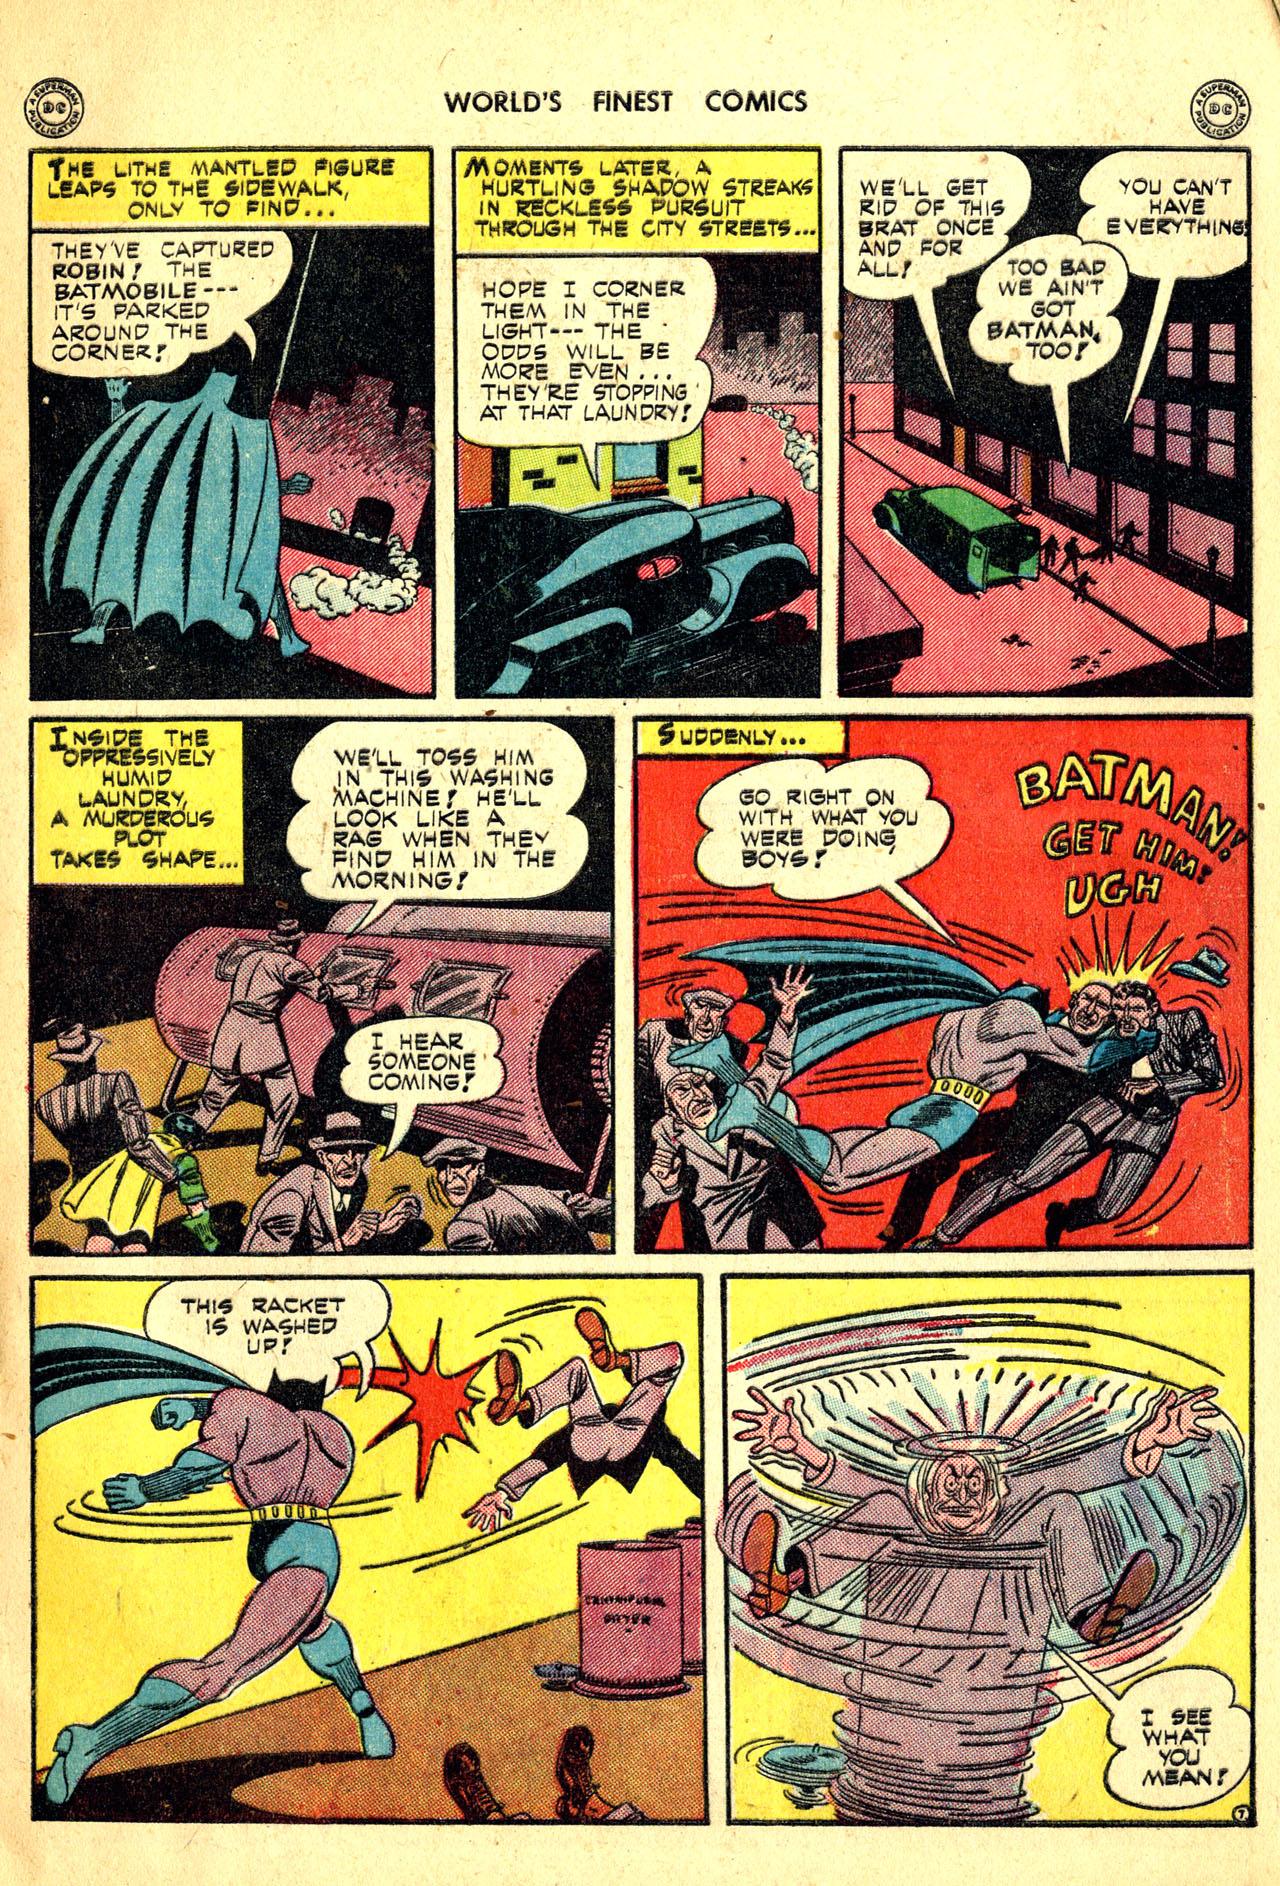 Read online World's Finest Comics comic -  Issue #18 - 75